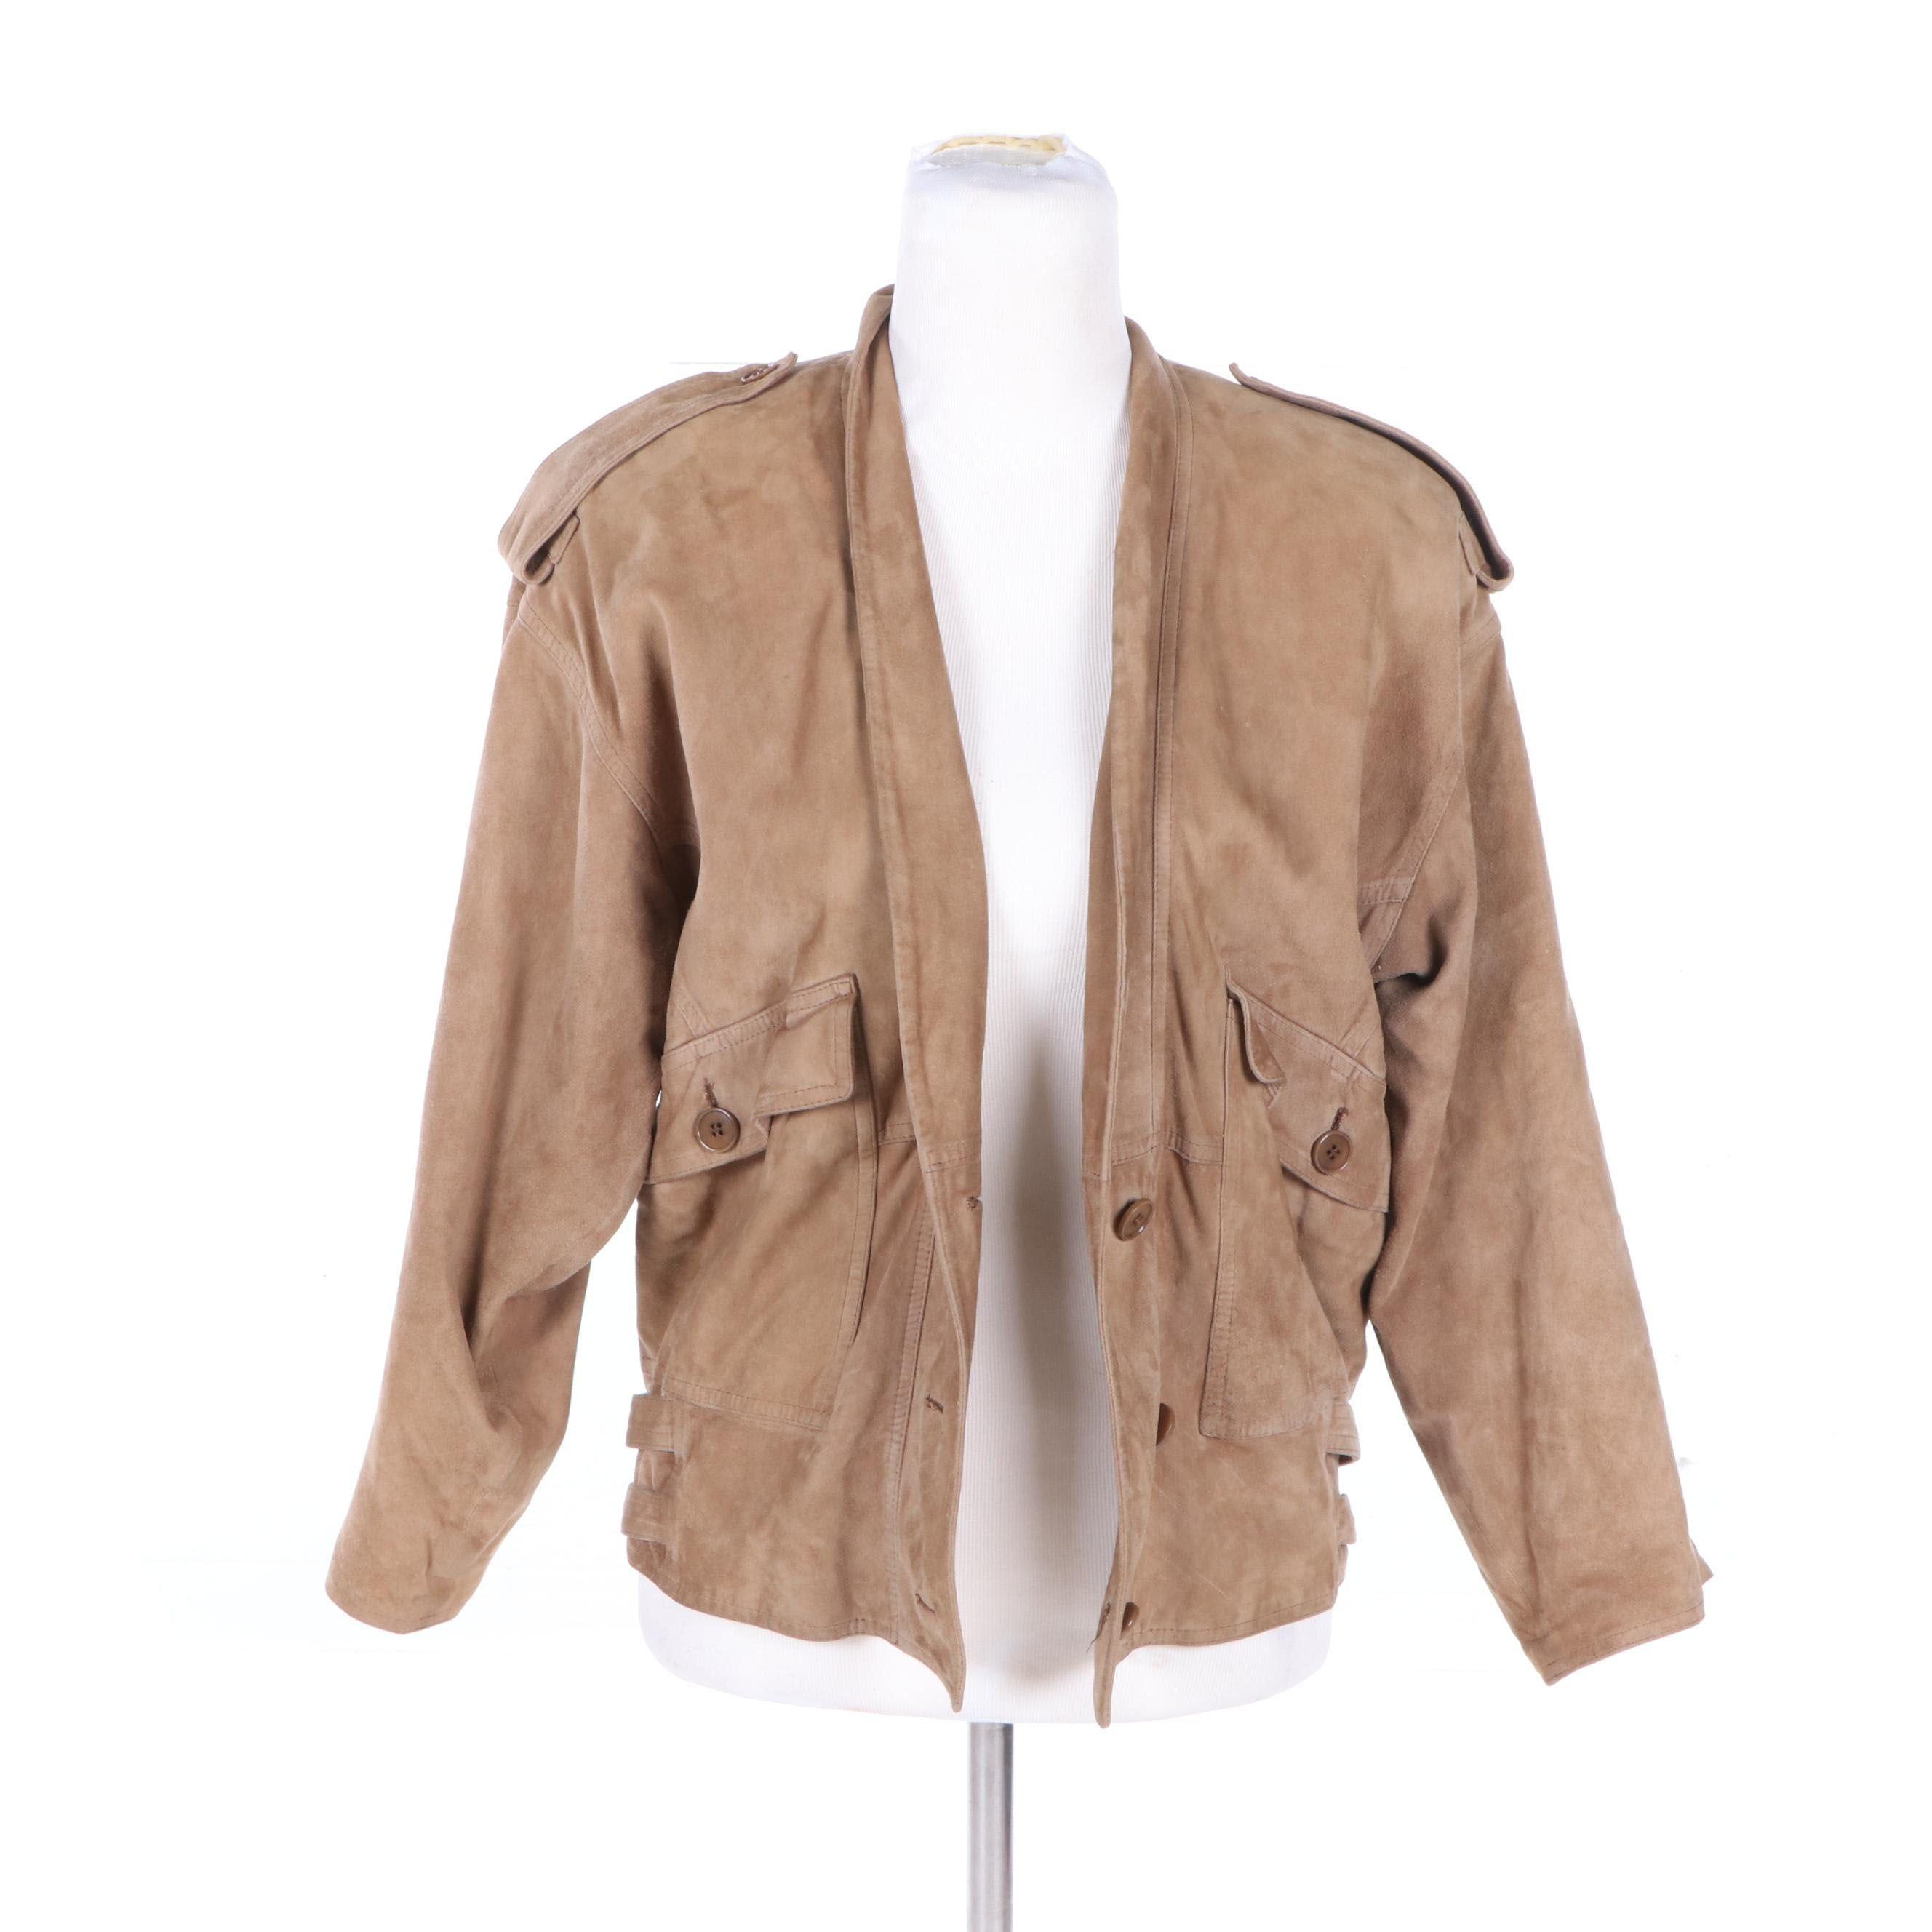 Vintage Leather Jackets Including Calvin Klein